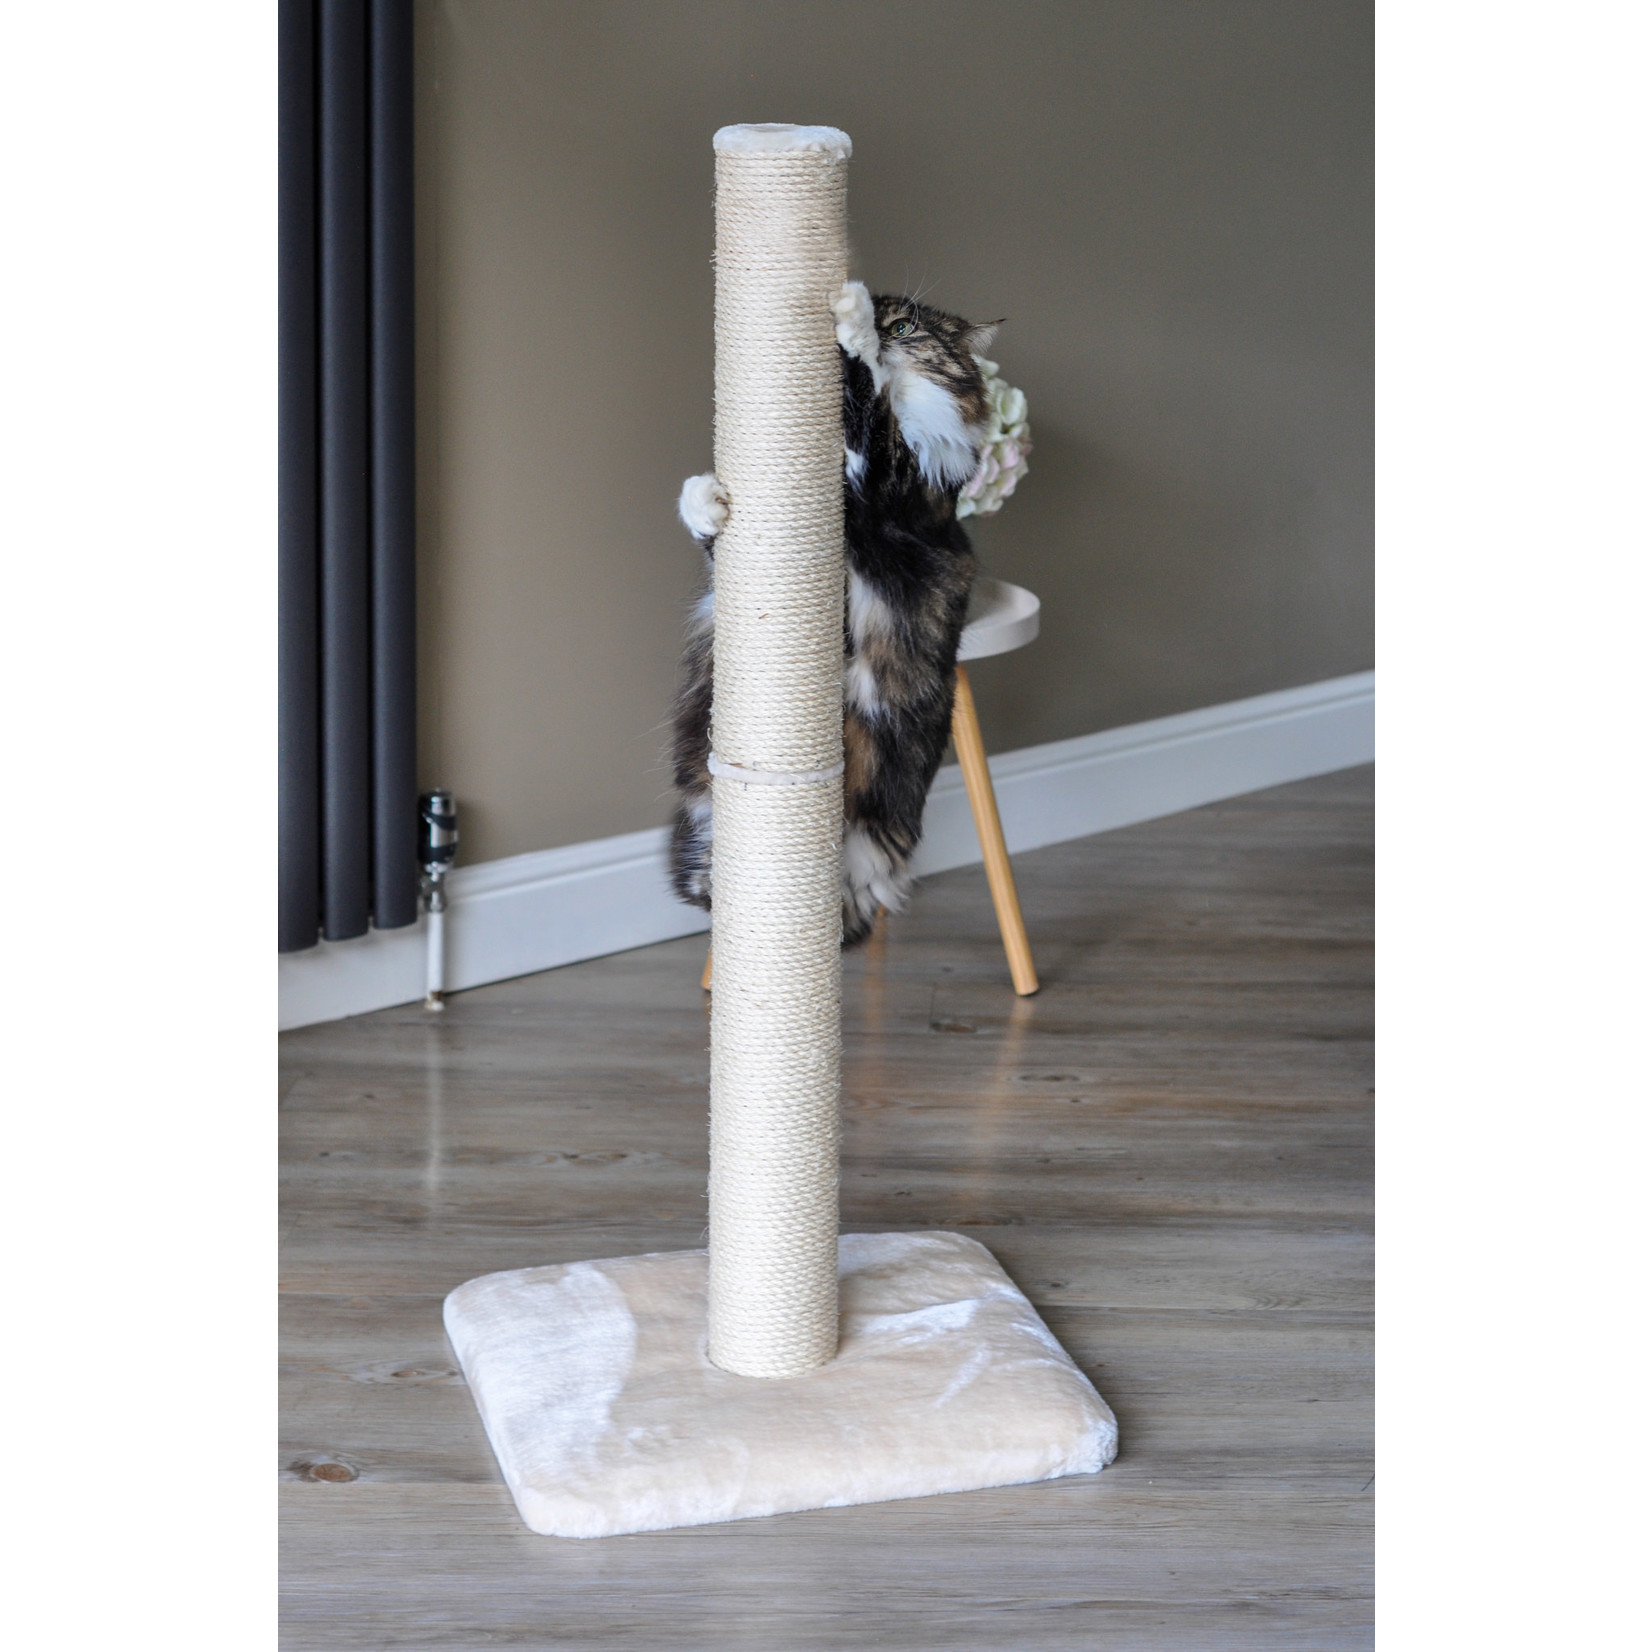 Zöon Deluxe Scratch Cat Scratching Post, 1m